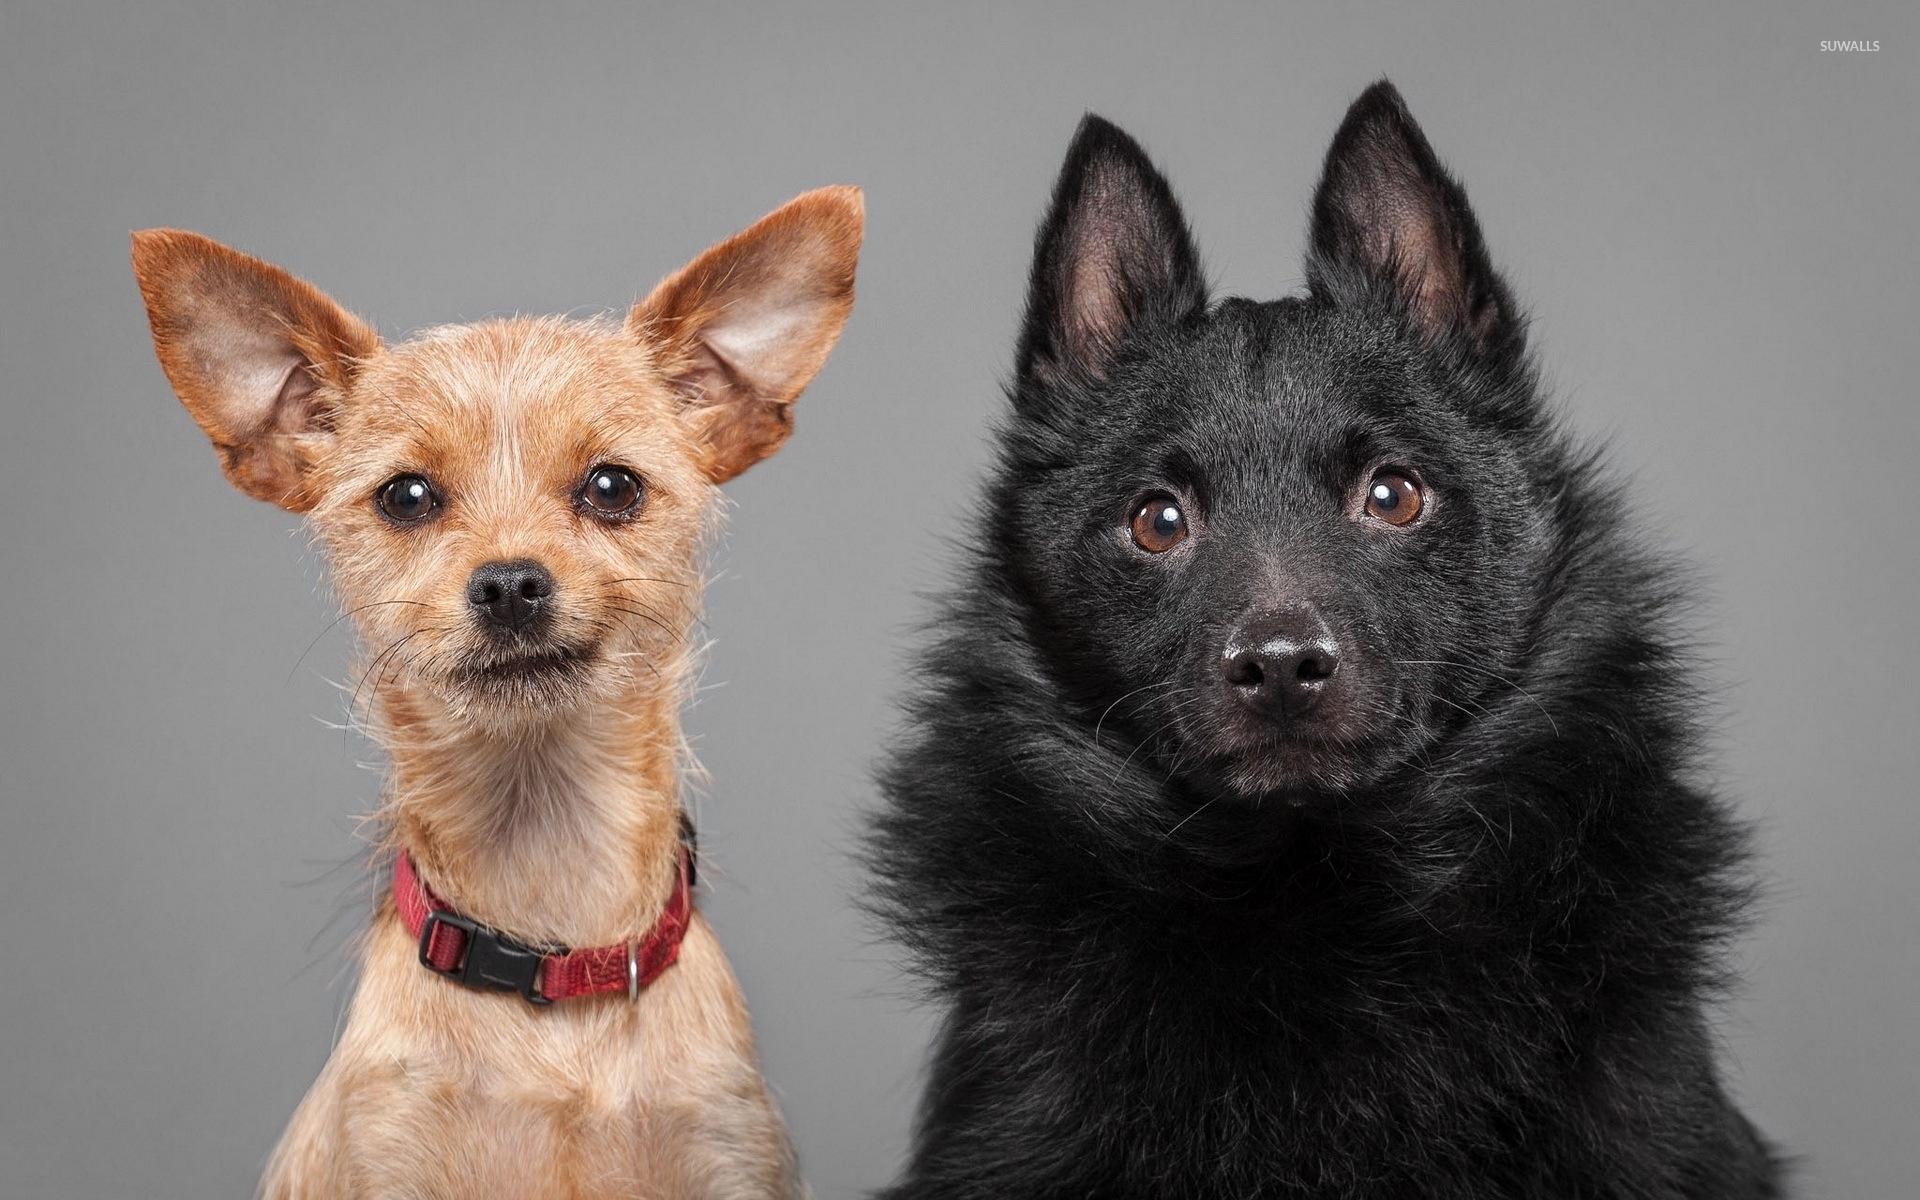 cute puppies [3] wallpaper - animal wallpapers - #46944